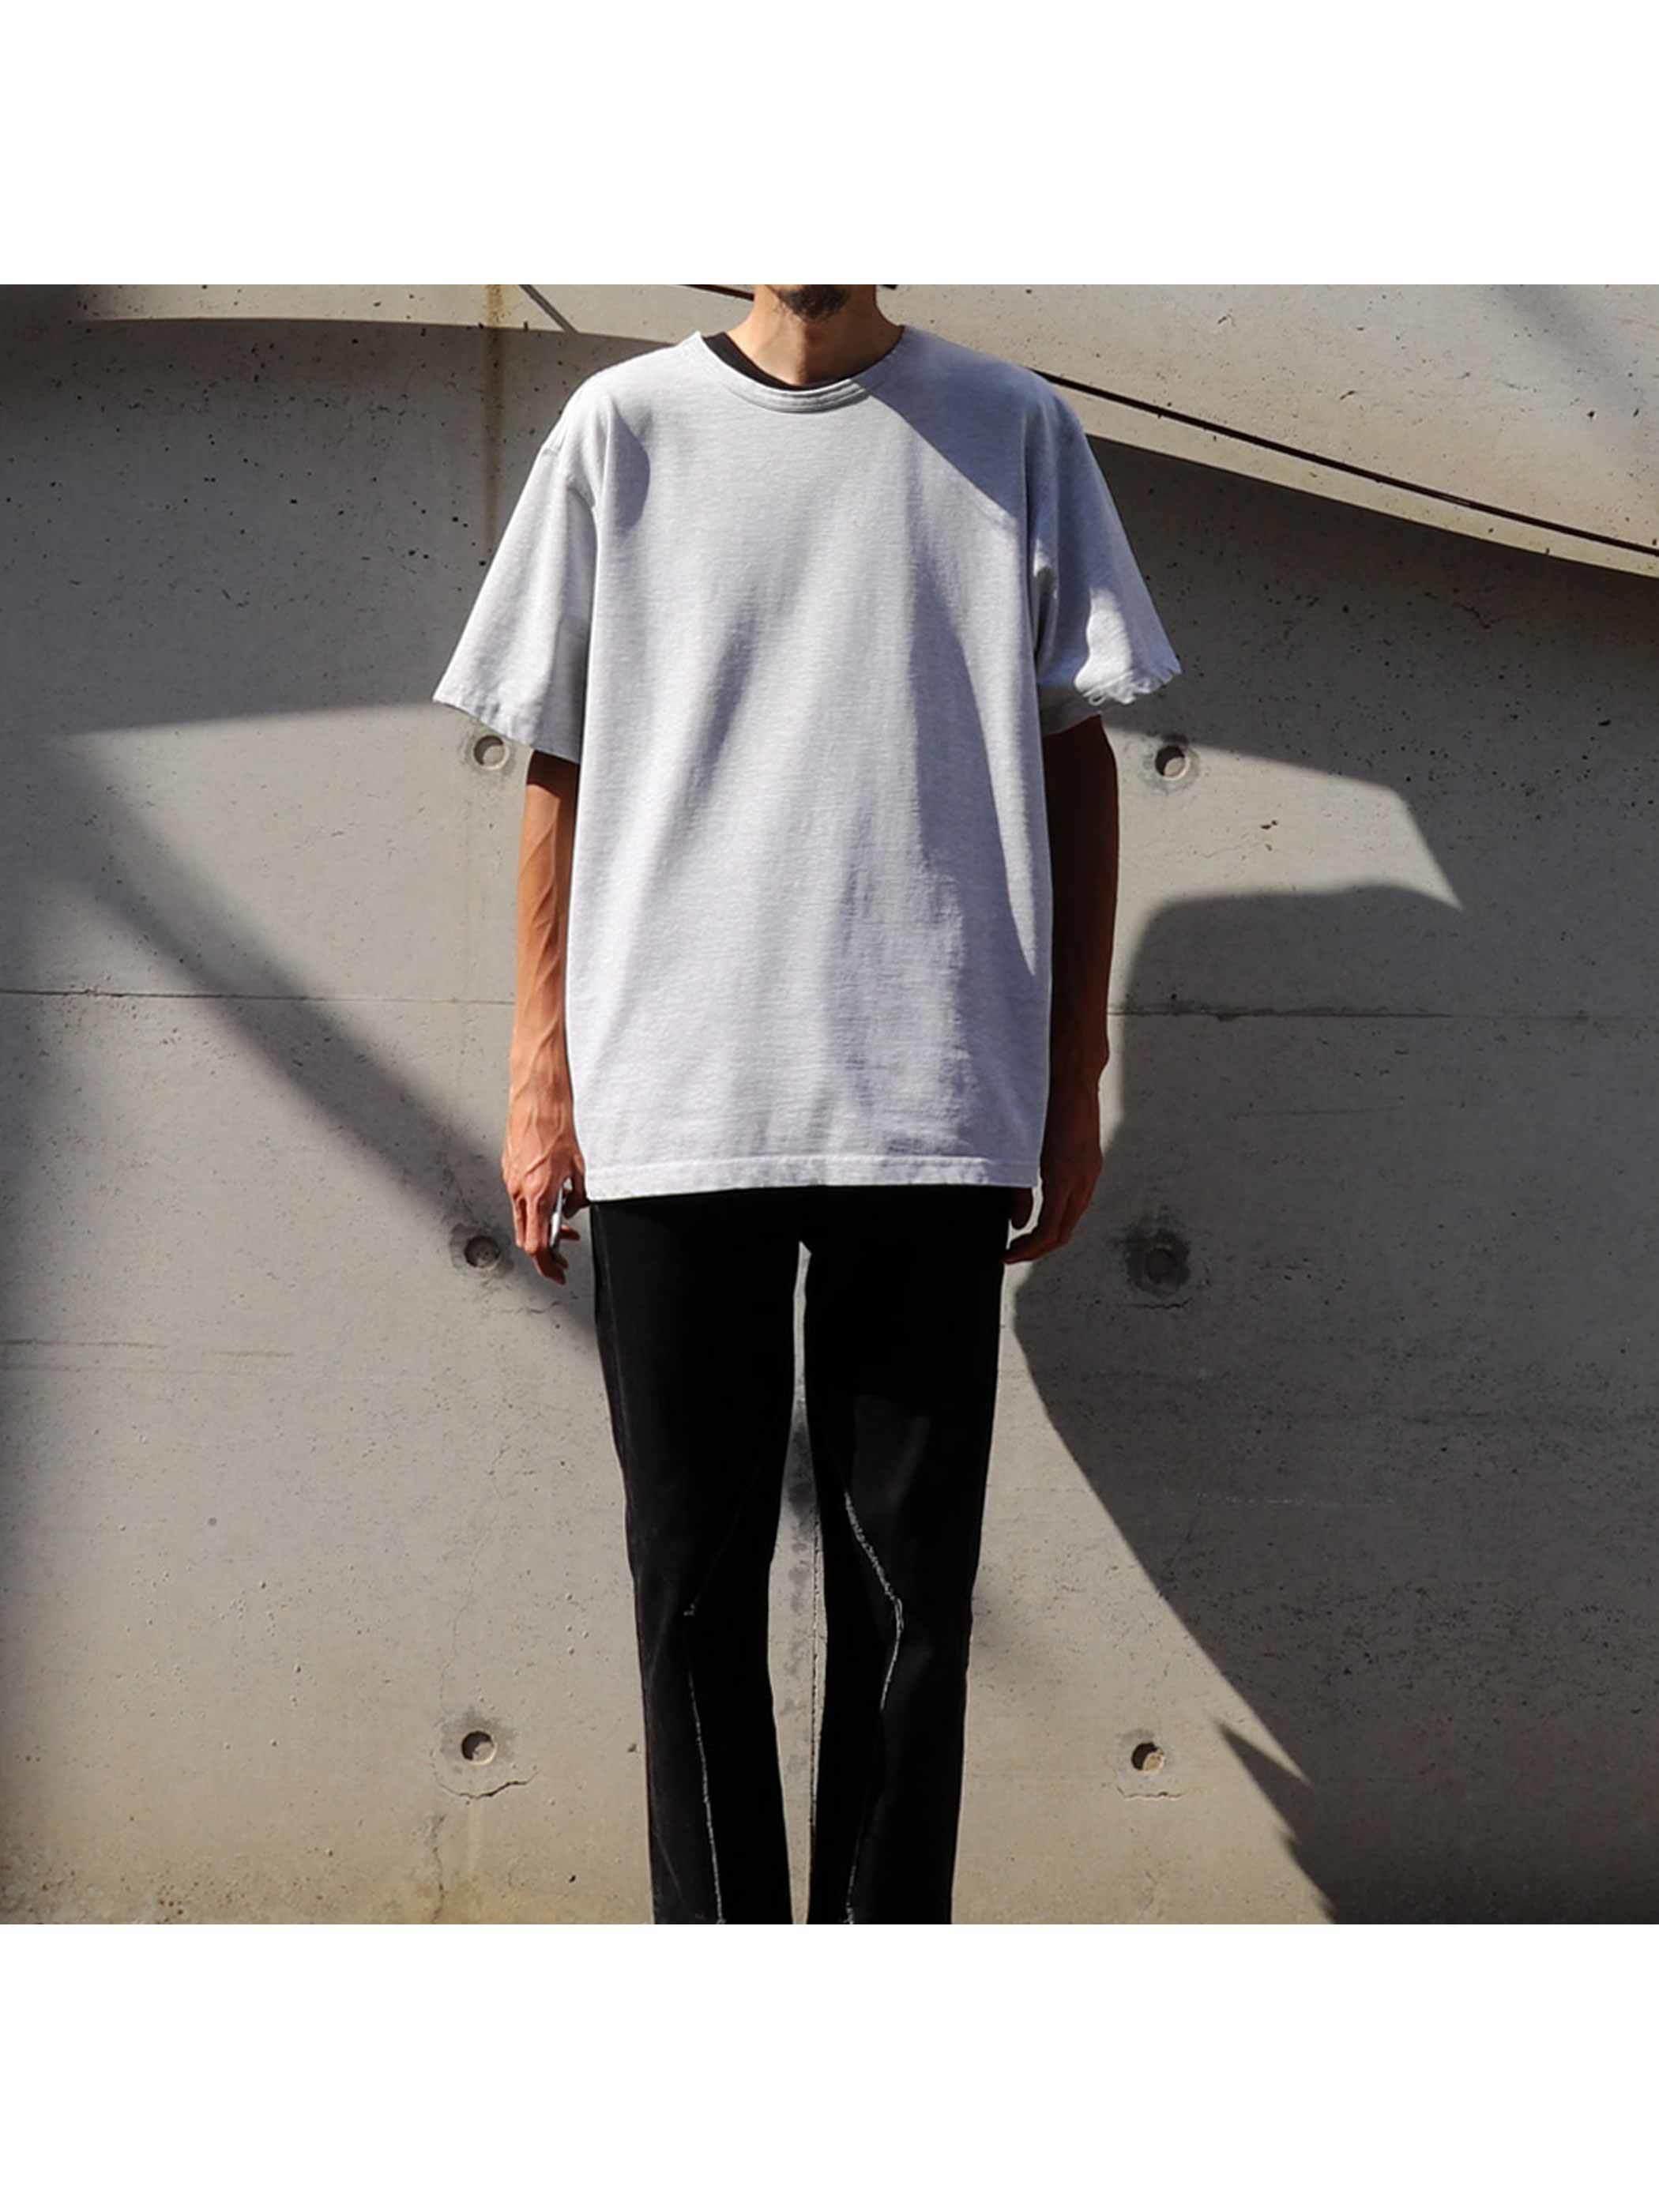 90's~ SIERRA DESIGNS USA製 無地Tシャツ [L]